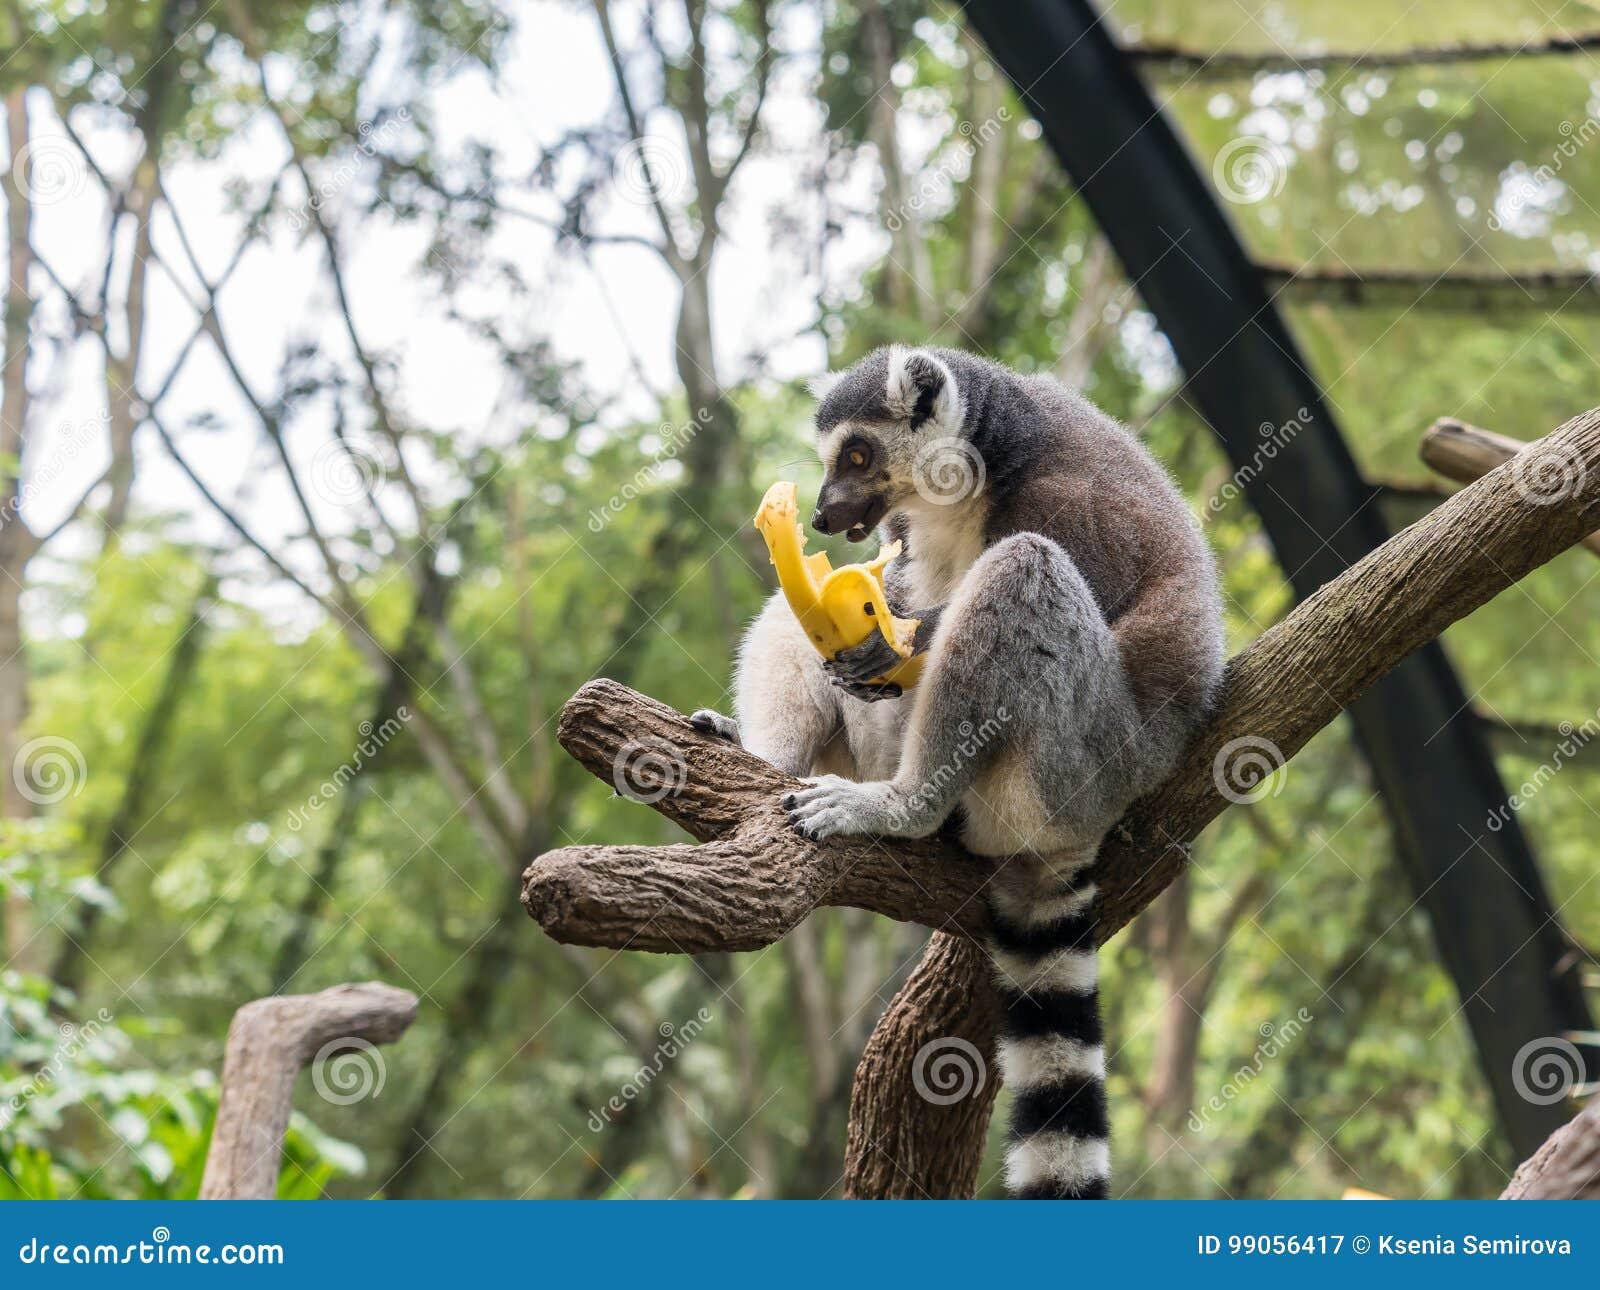 Ring Tailed Lemur Lemur Catta Eating A Banana Stock Image Image Of